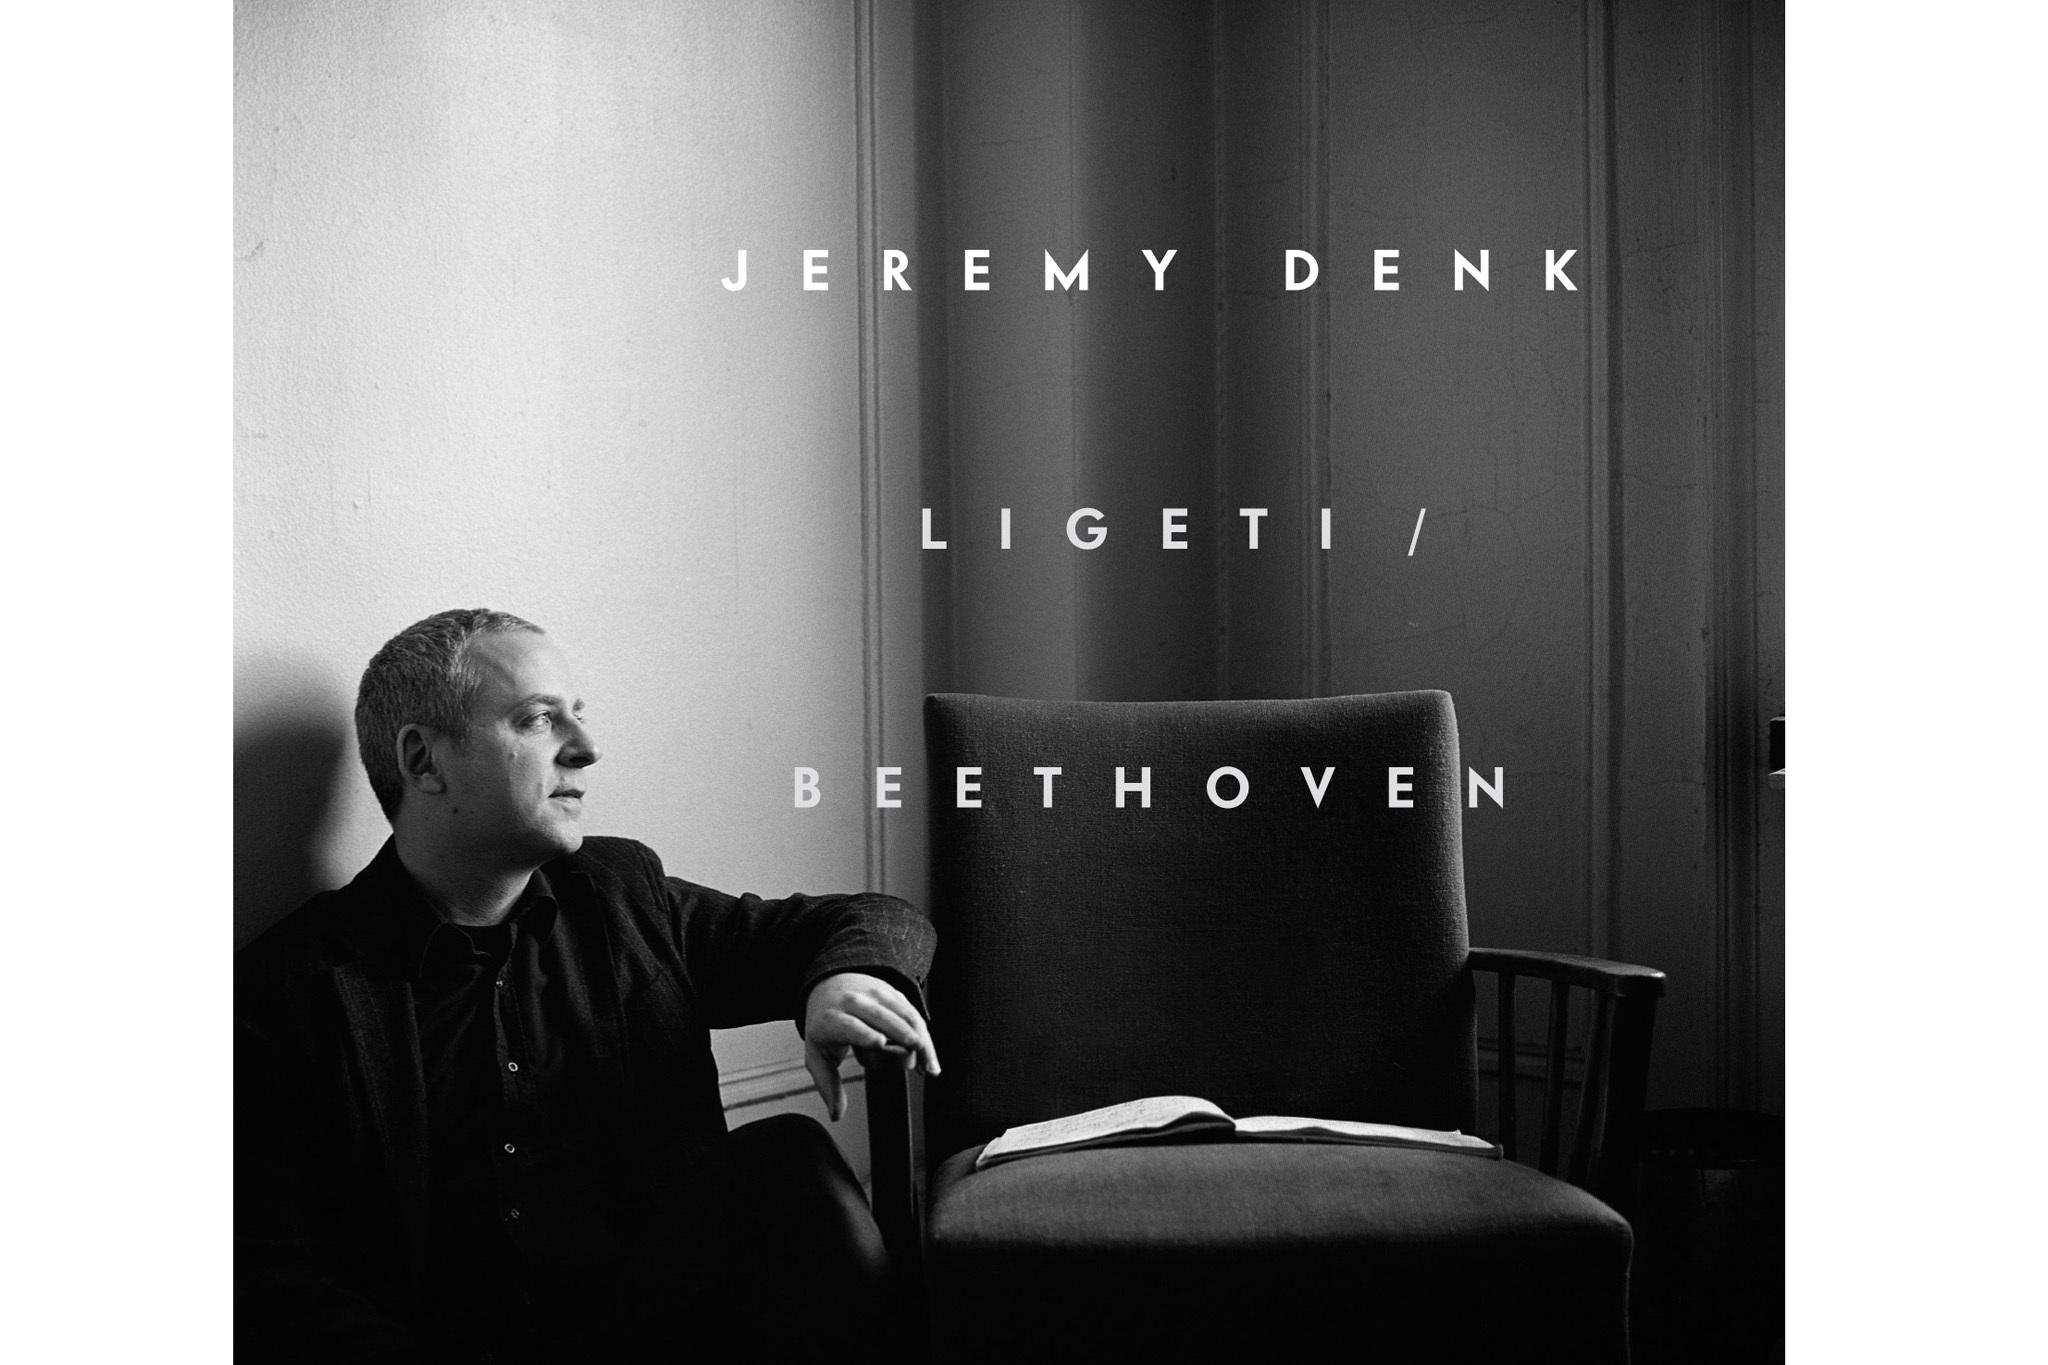 Jeremy Denk, Ligeti/Beethoven (Nonesuch)